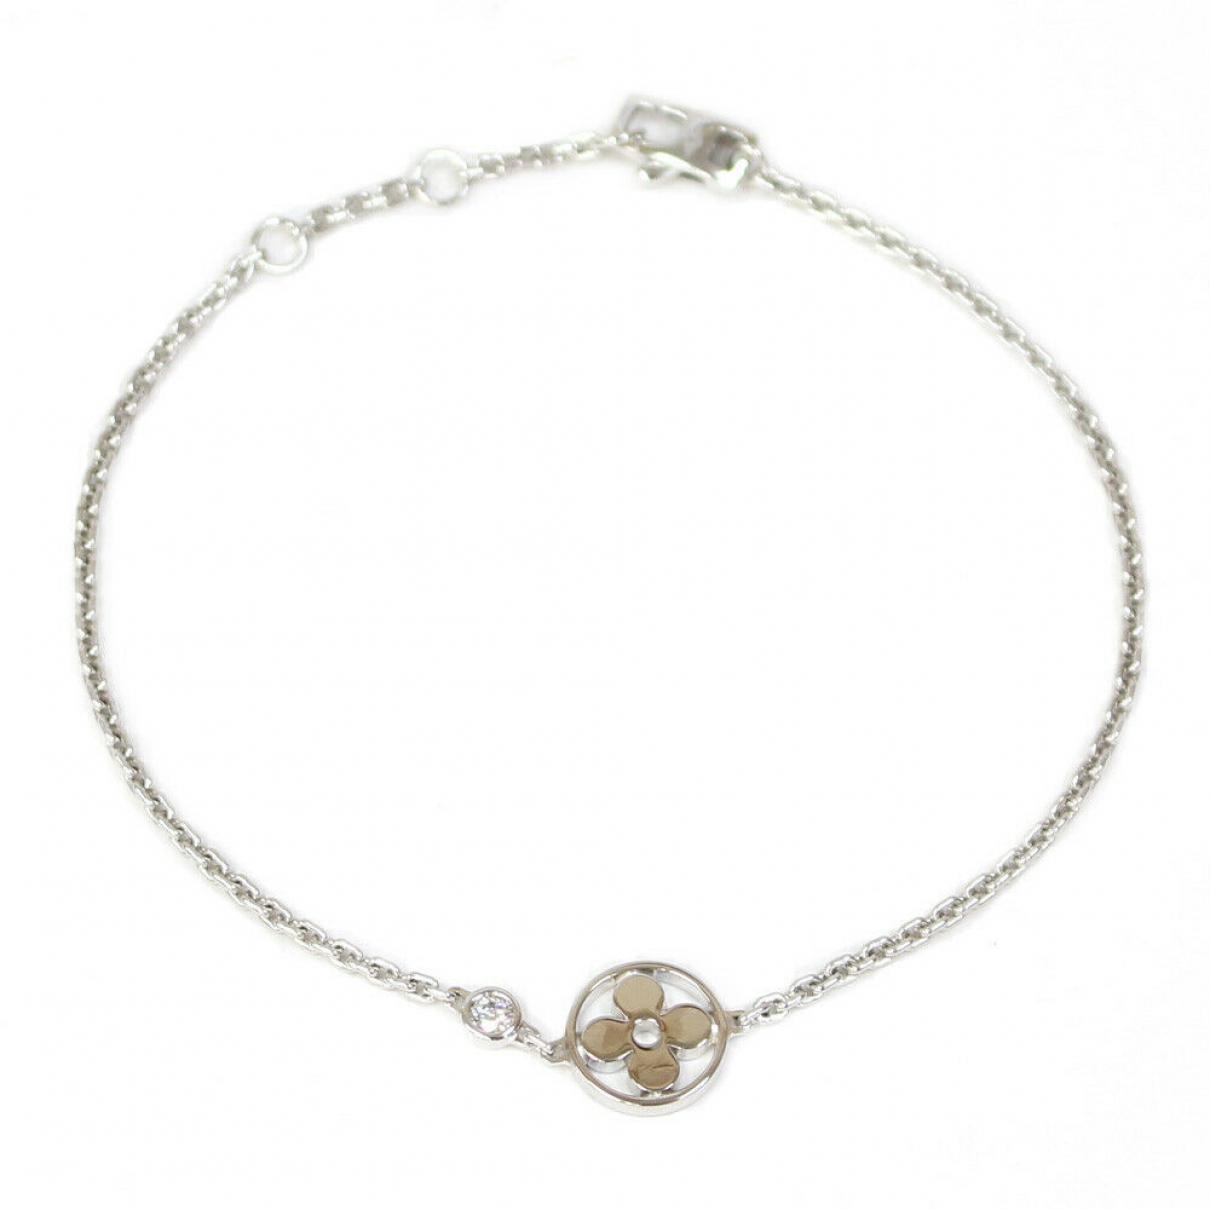 Louis Vuitton N White gold bracelet for Women N